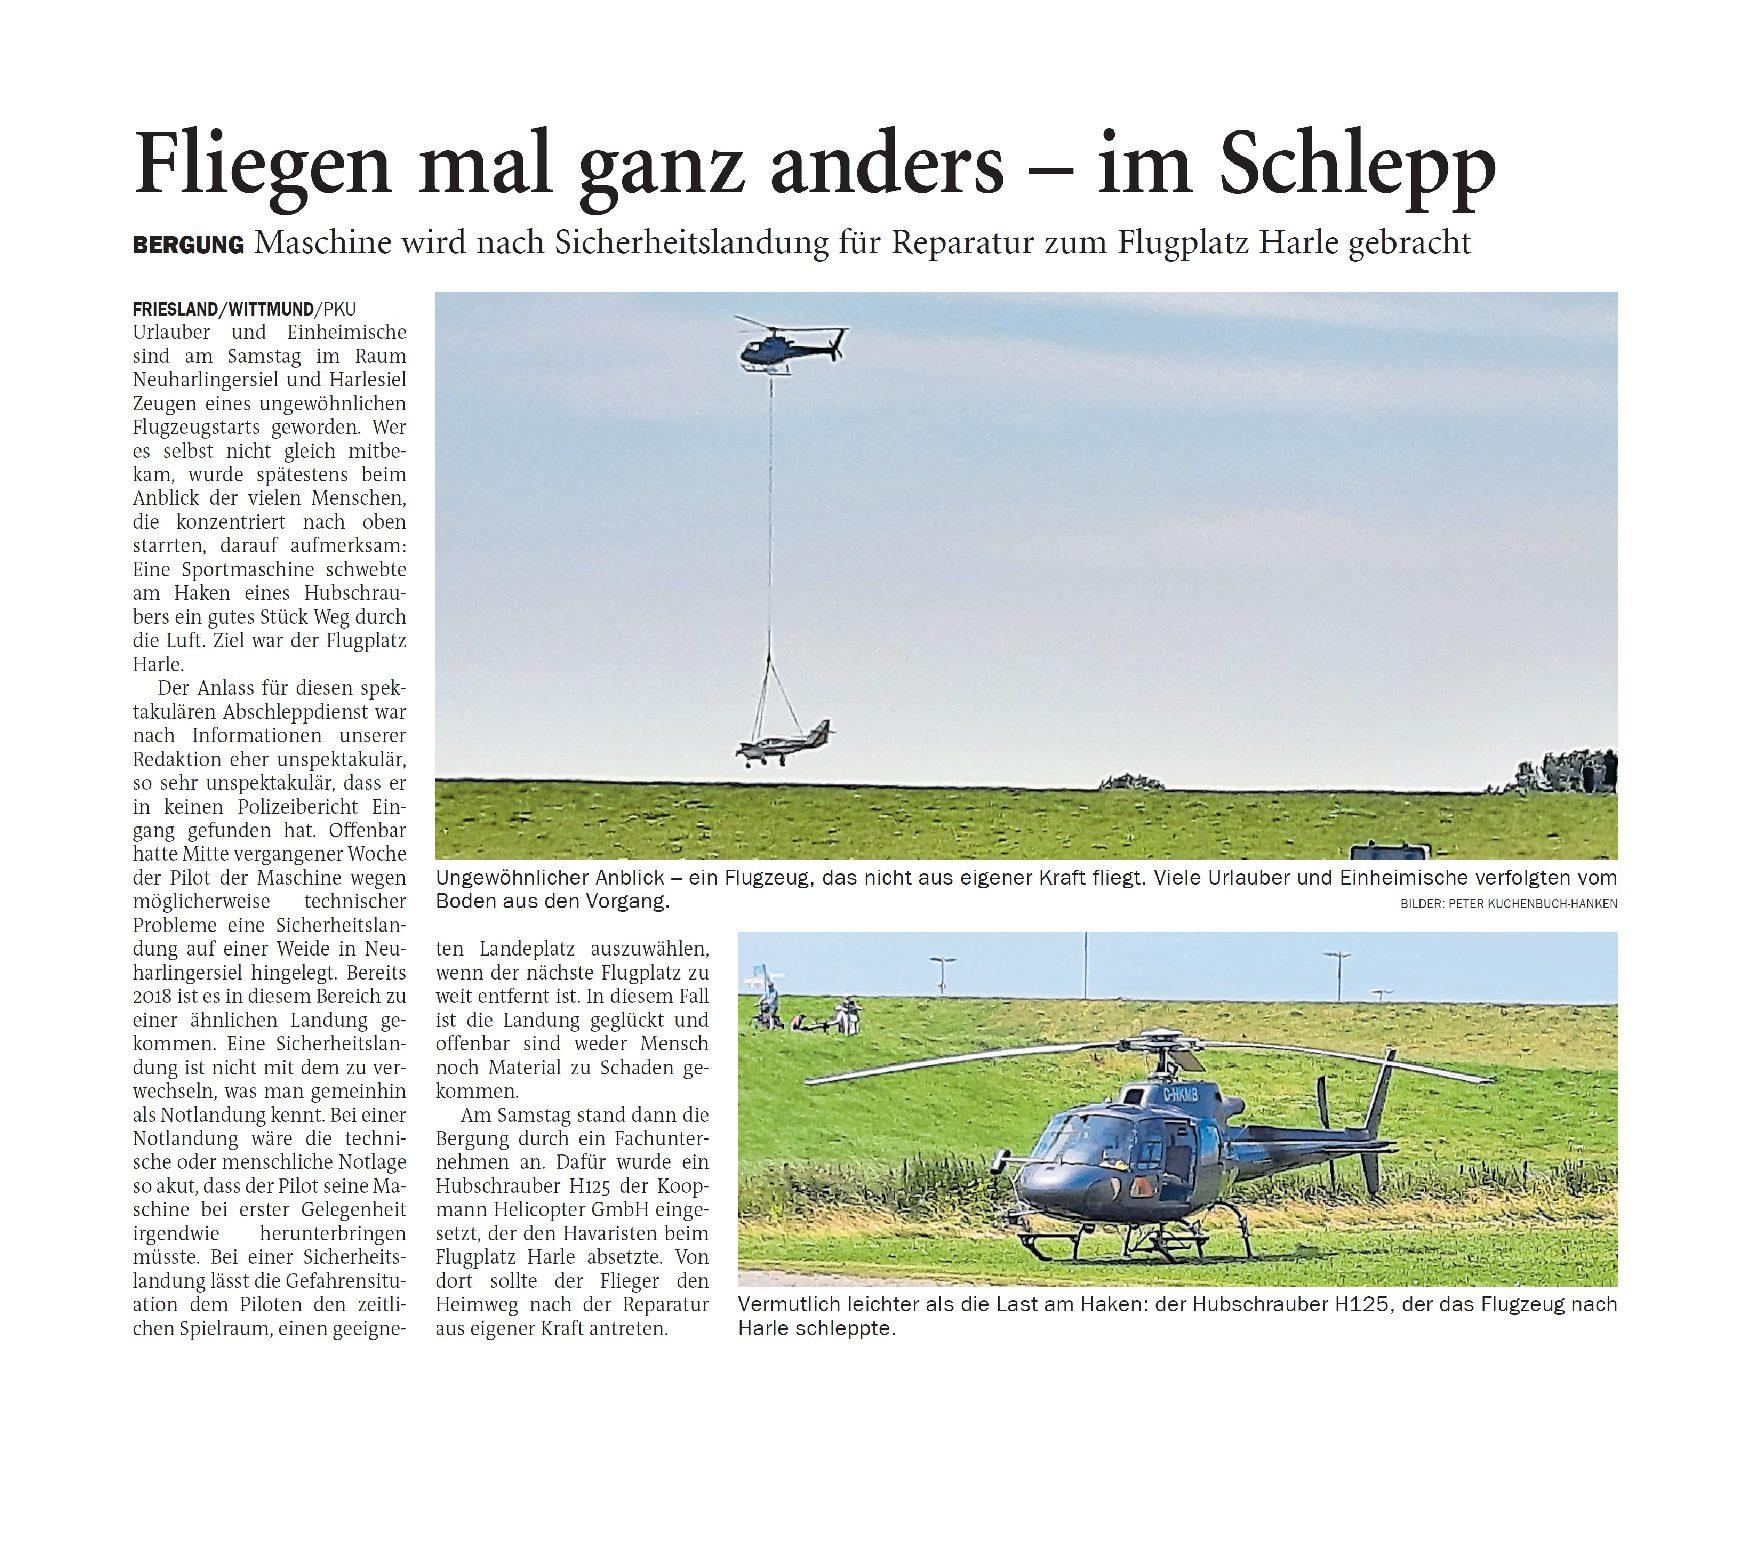 Jeversches Wochenblatt 26.07.2021 III